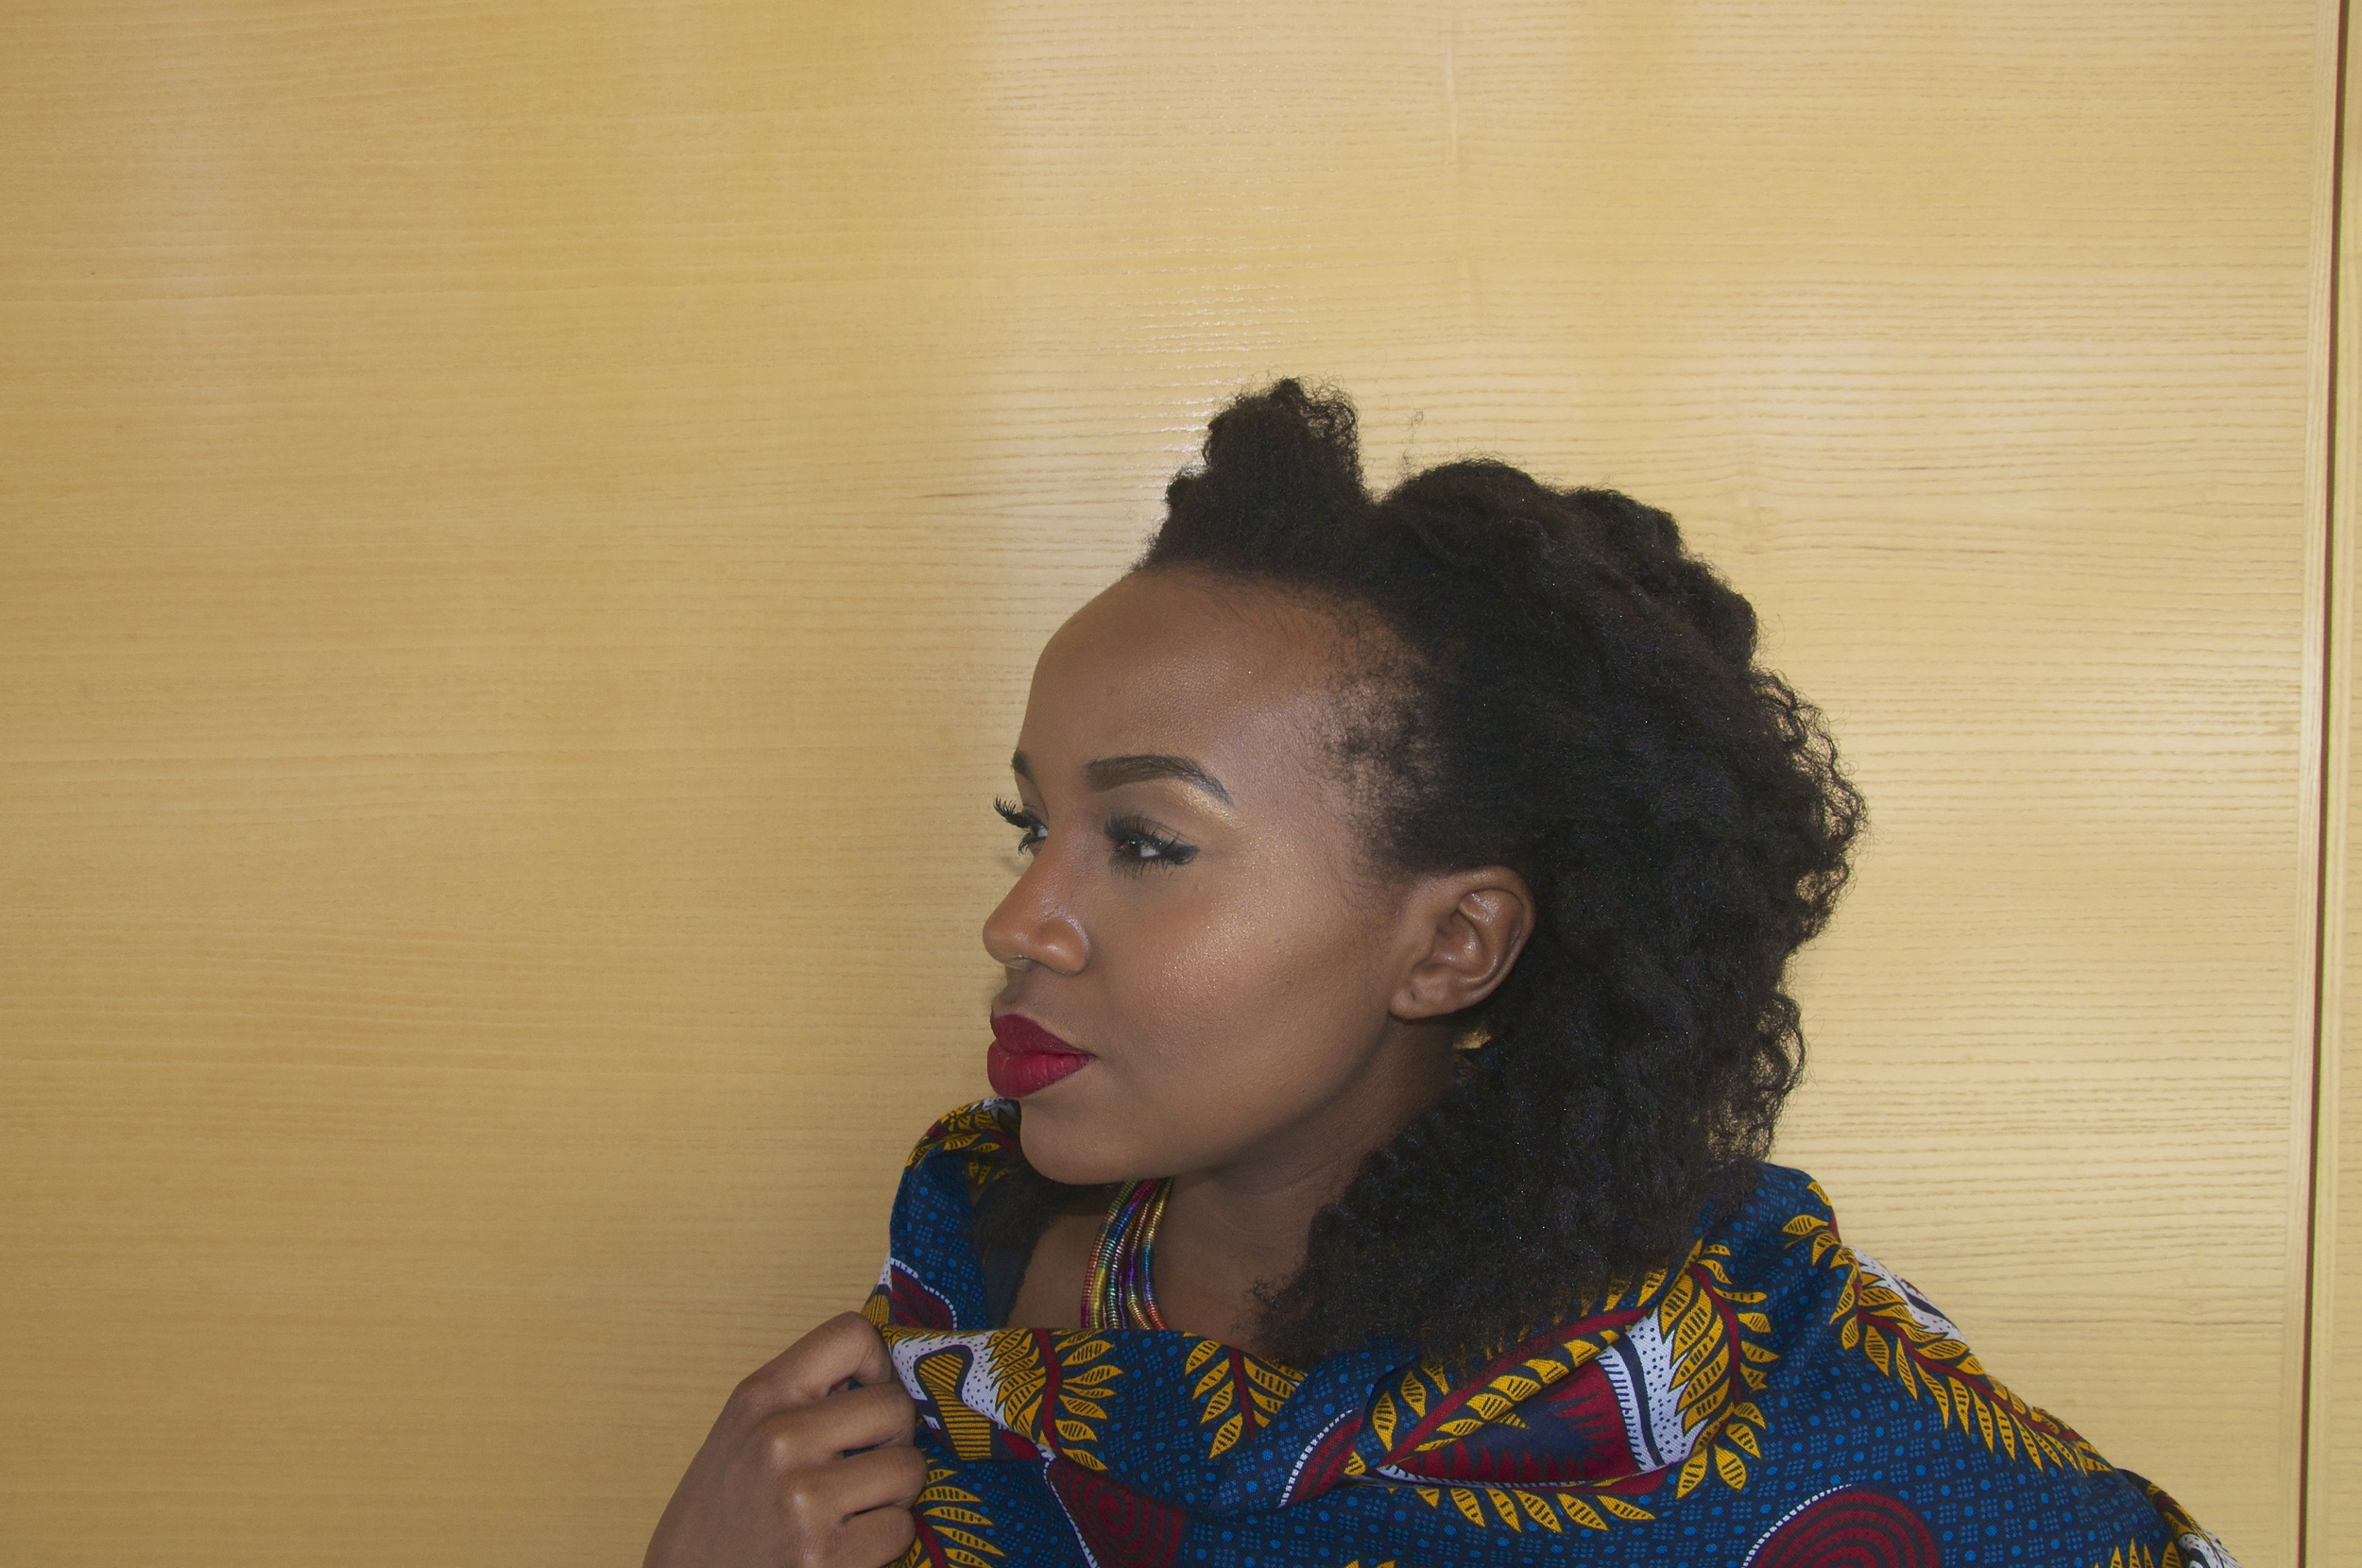 Is natural hair beautiful?